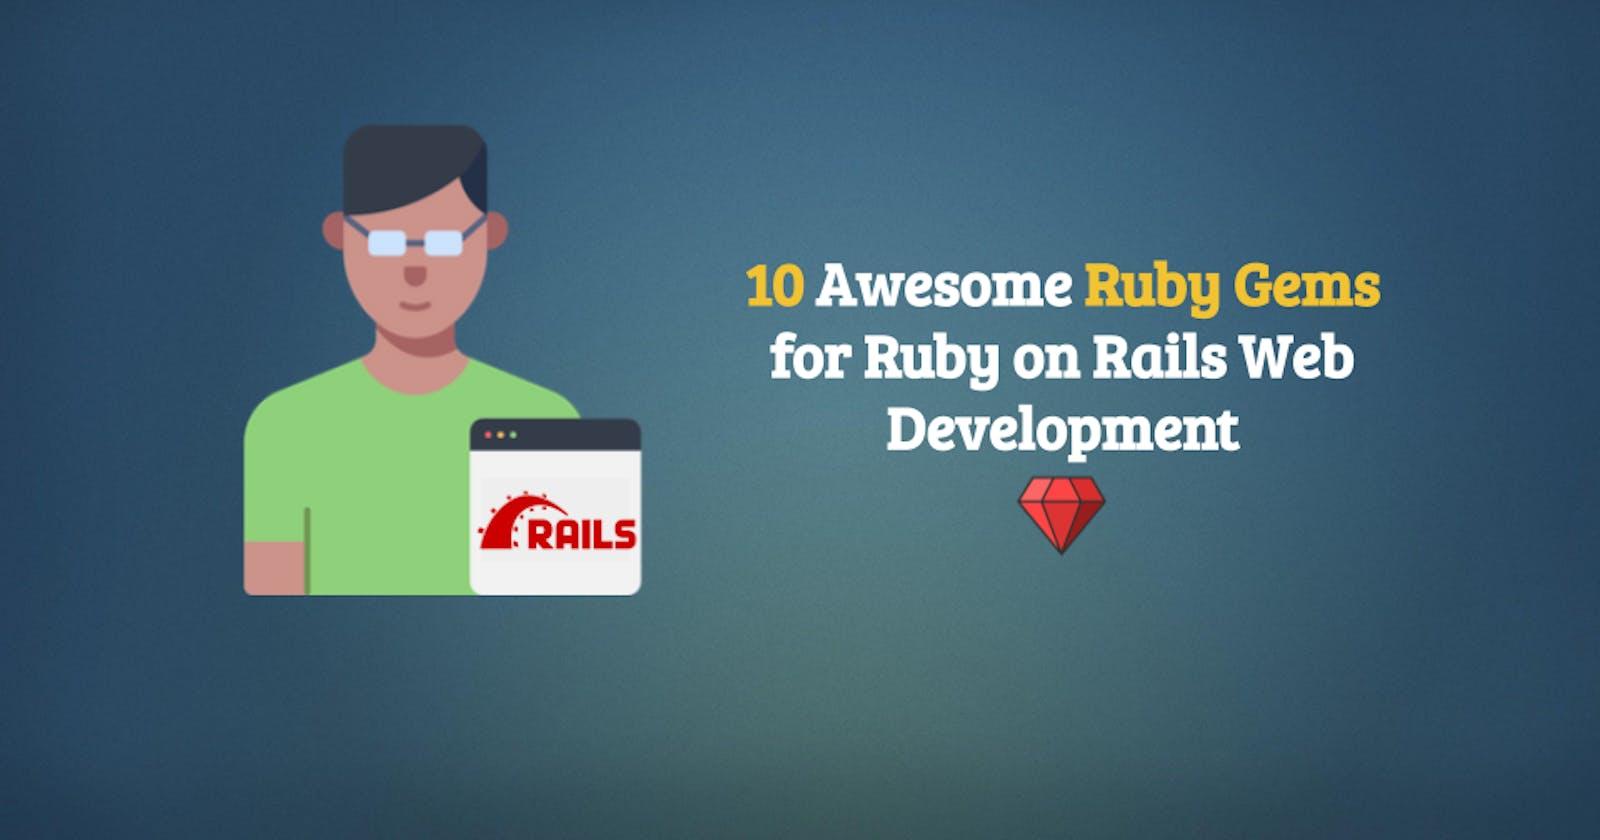 10 Awesome Ruby Gems for Ruby on Rails Web Development